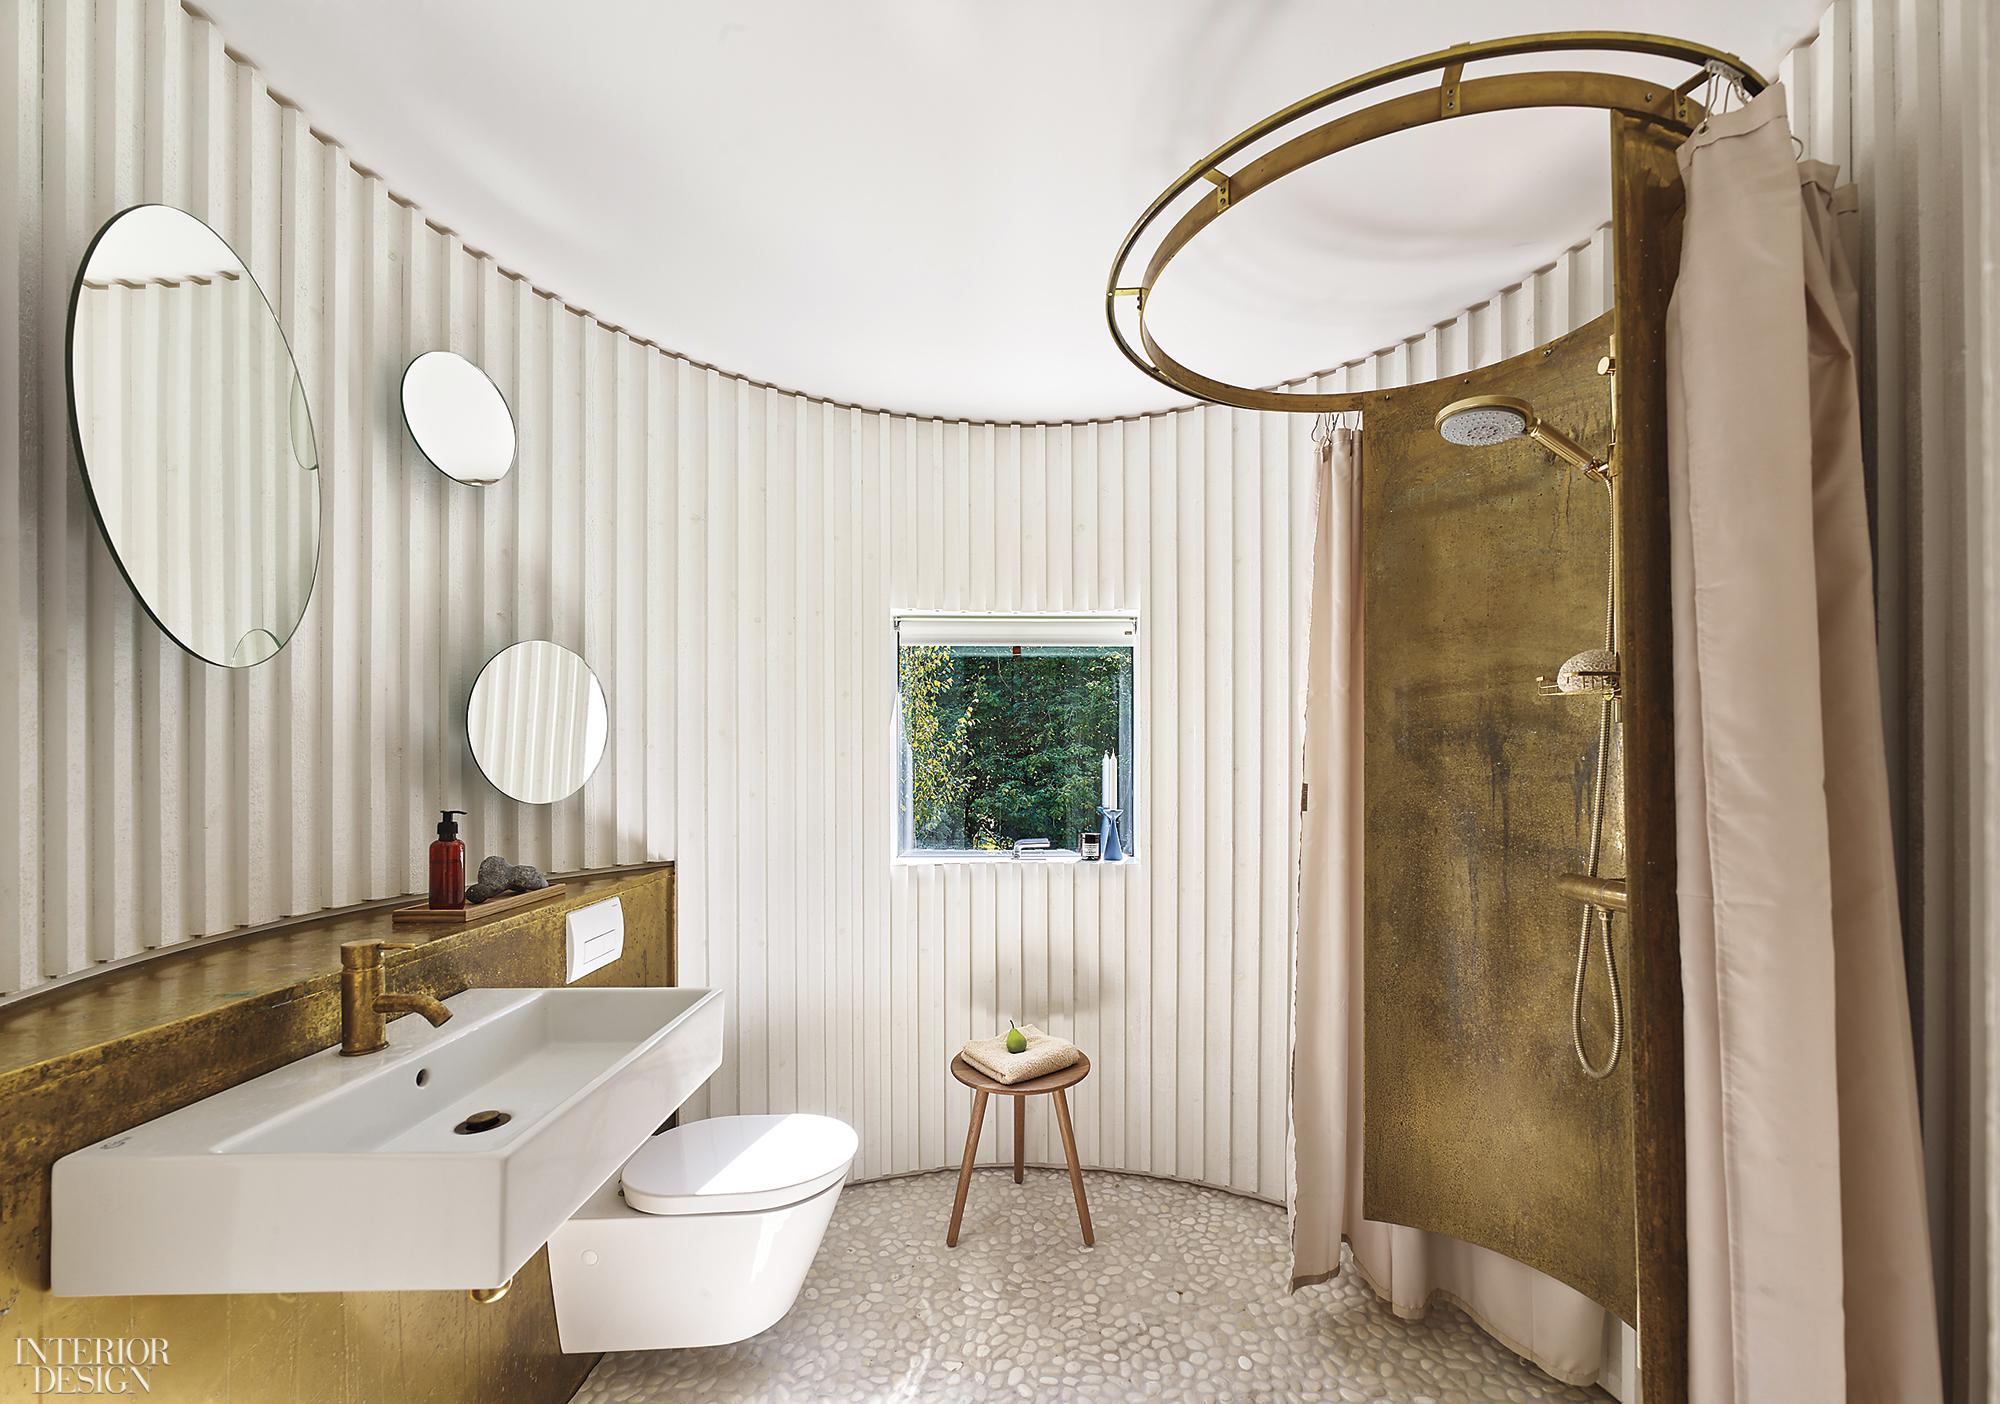 April Showers 20 Bathrooms With Gorgeous Shower Designs Interior Design Magazine